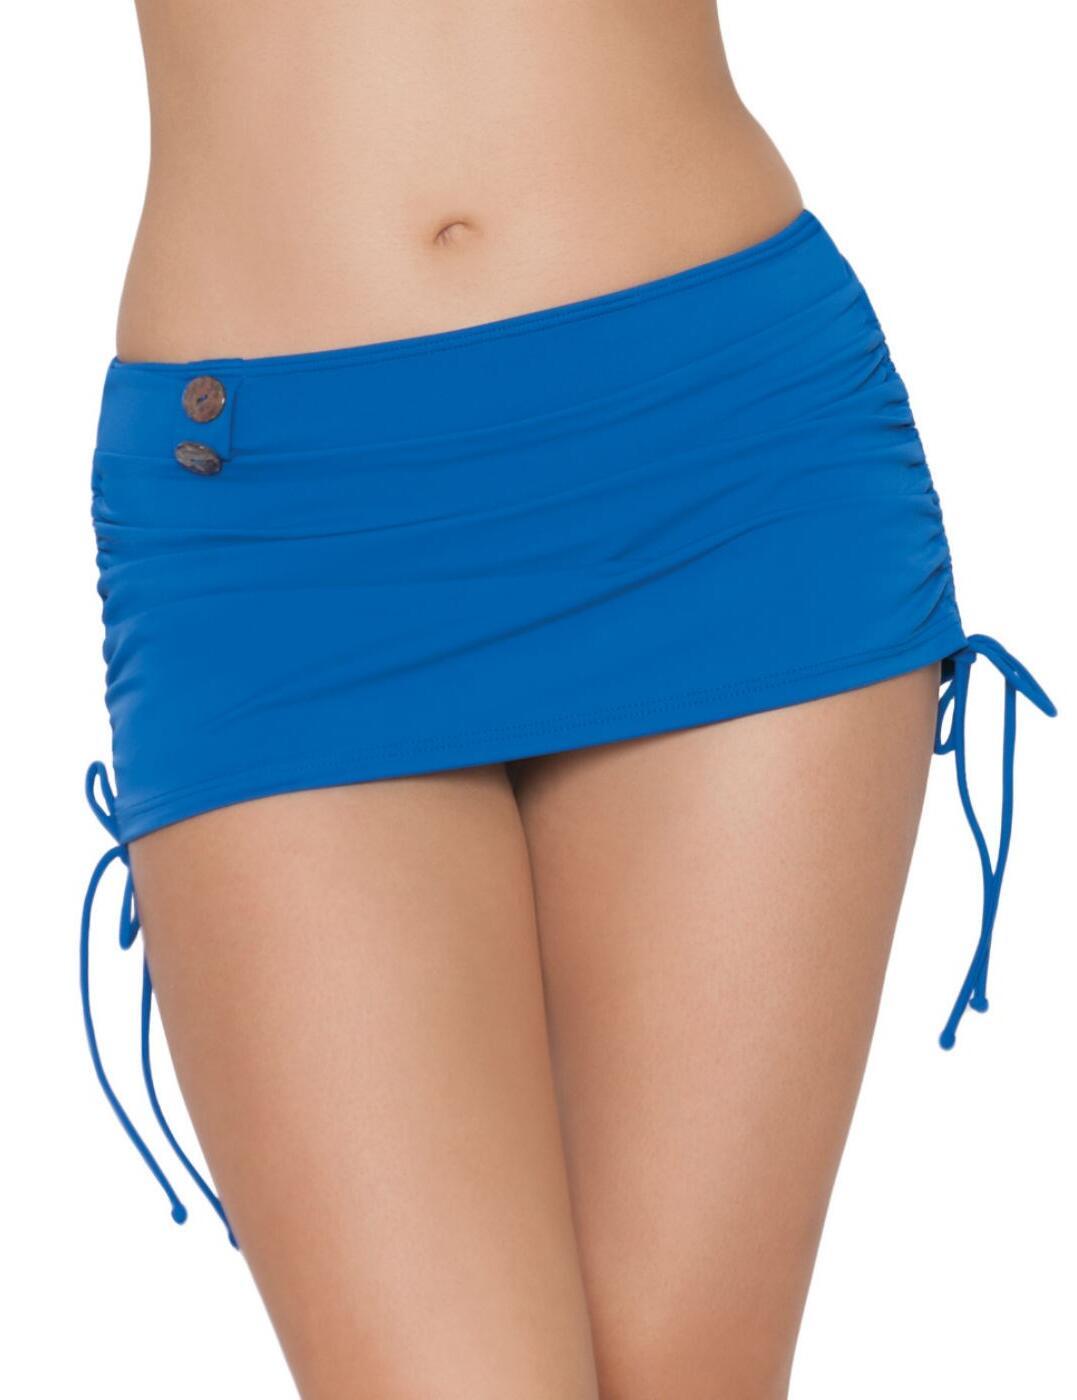 CS1955 Curvy Kate Luau Love Swim Skirt - CS1955 Deep Sea